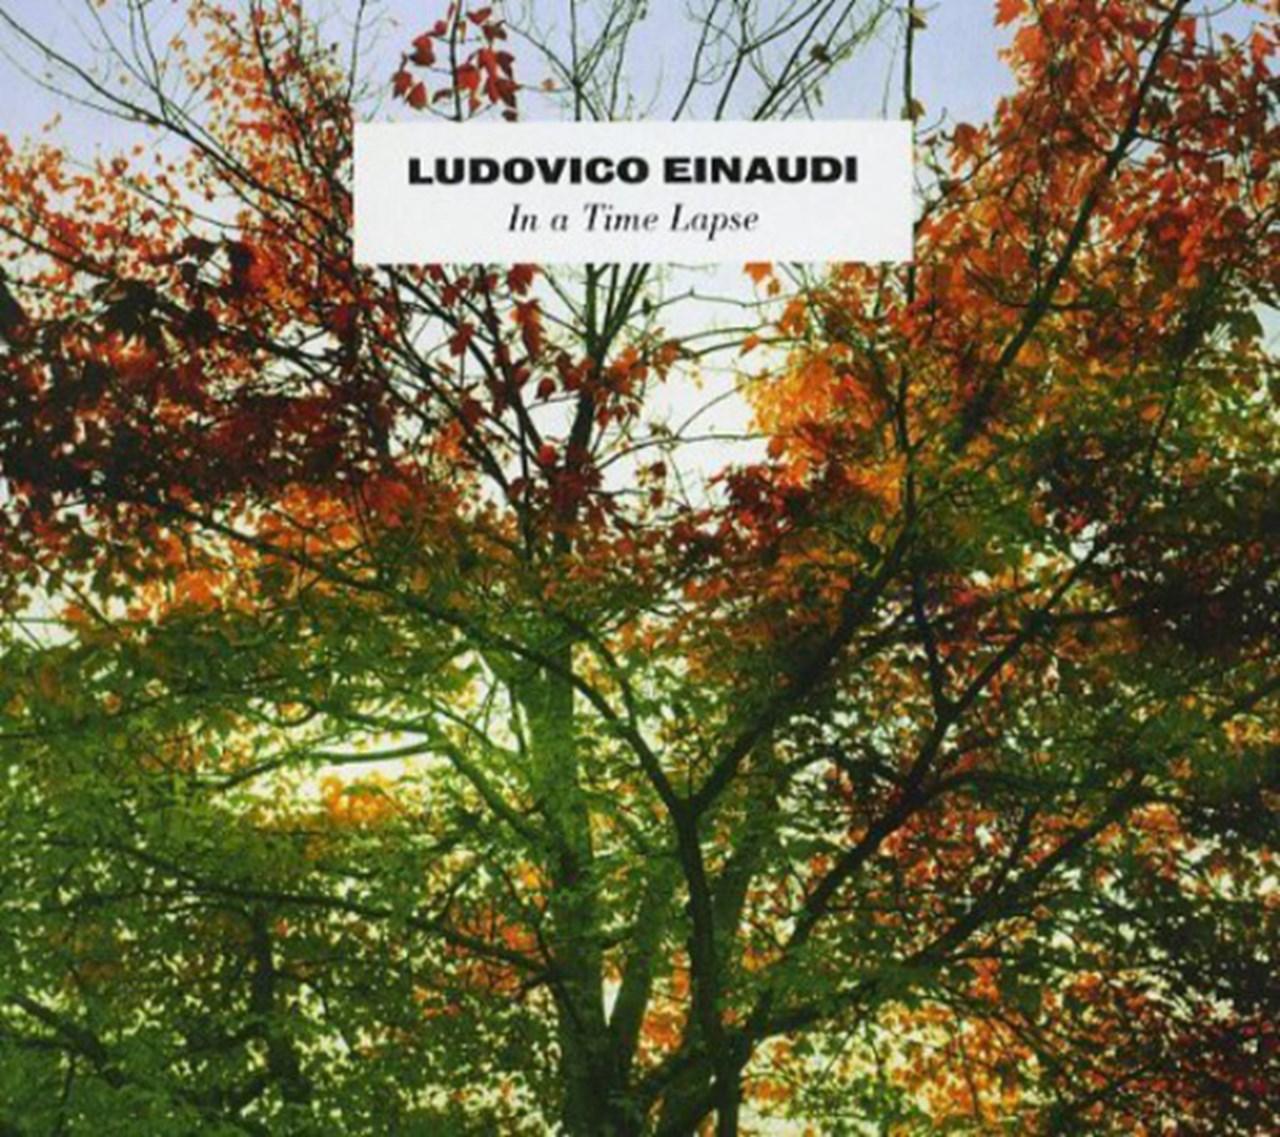 Ludovico Einaudi: In a Time Lapse - 1